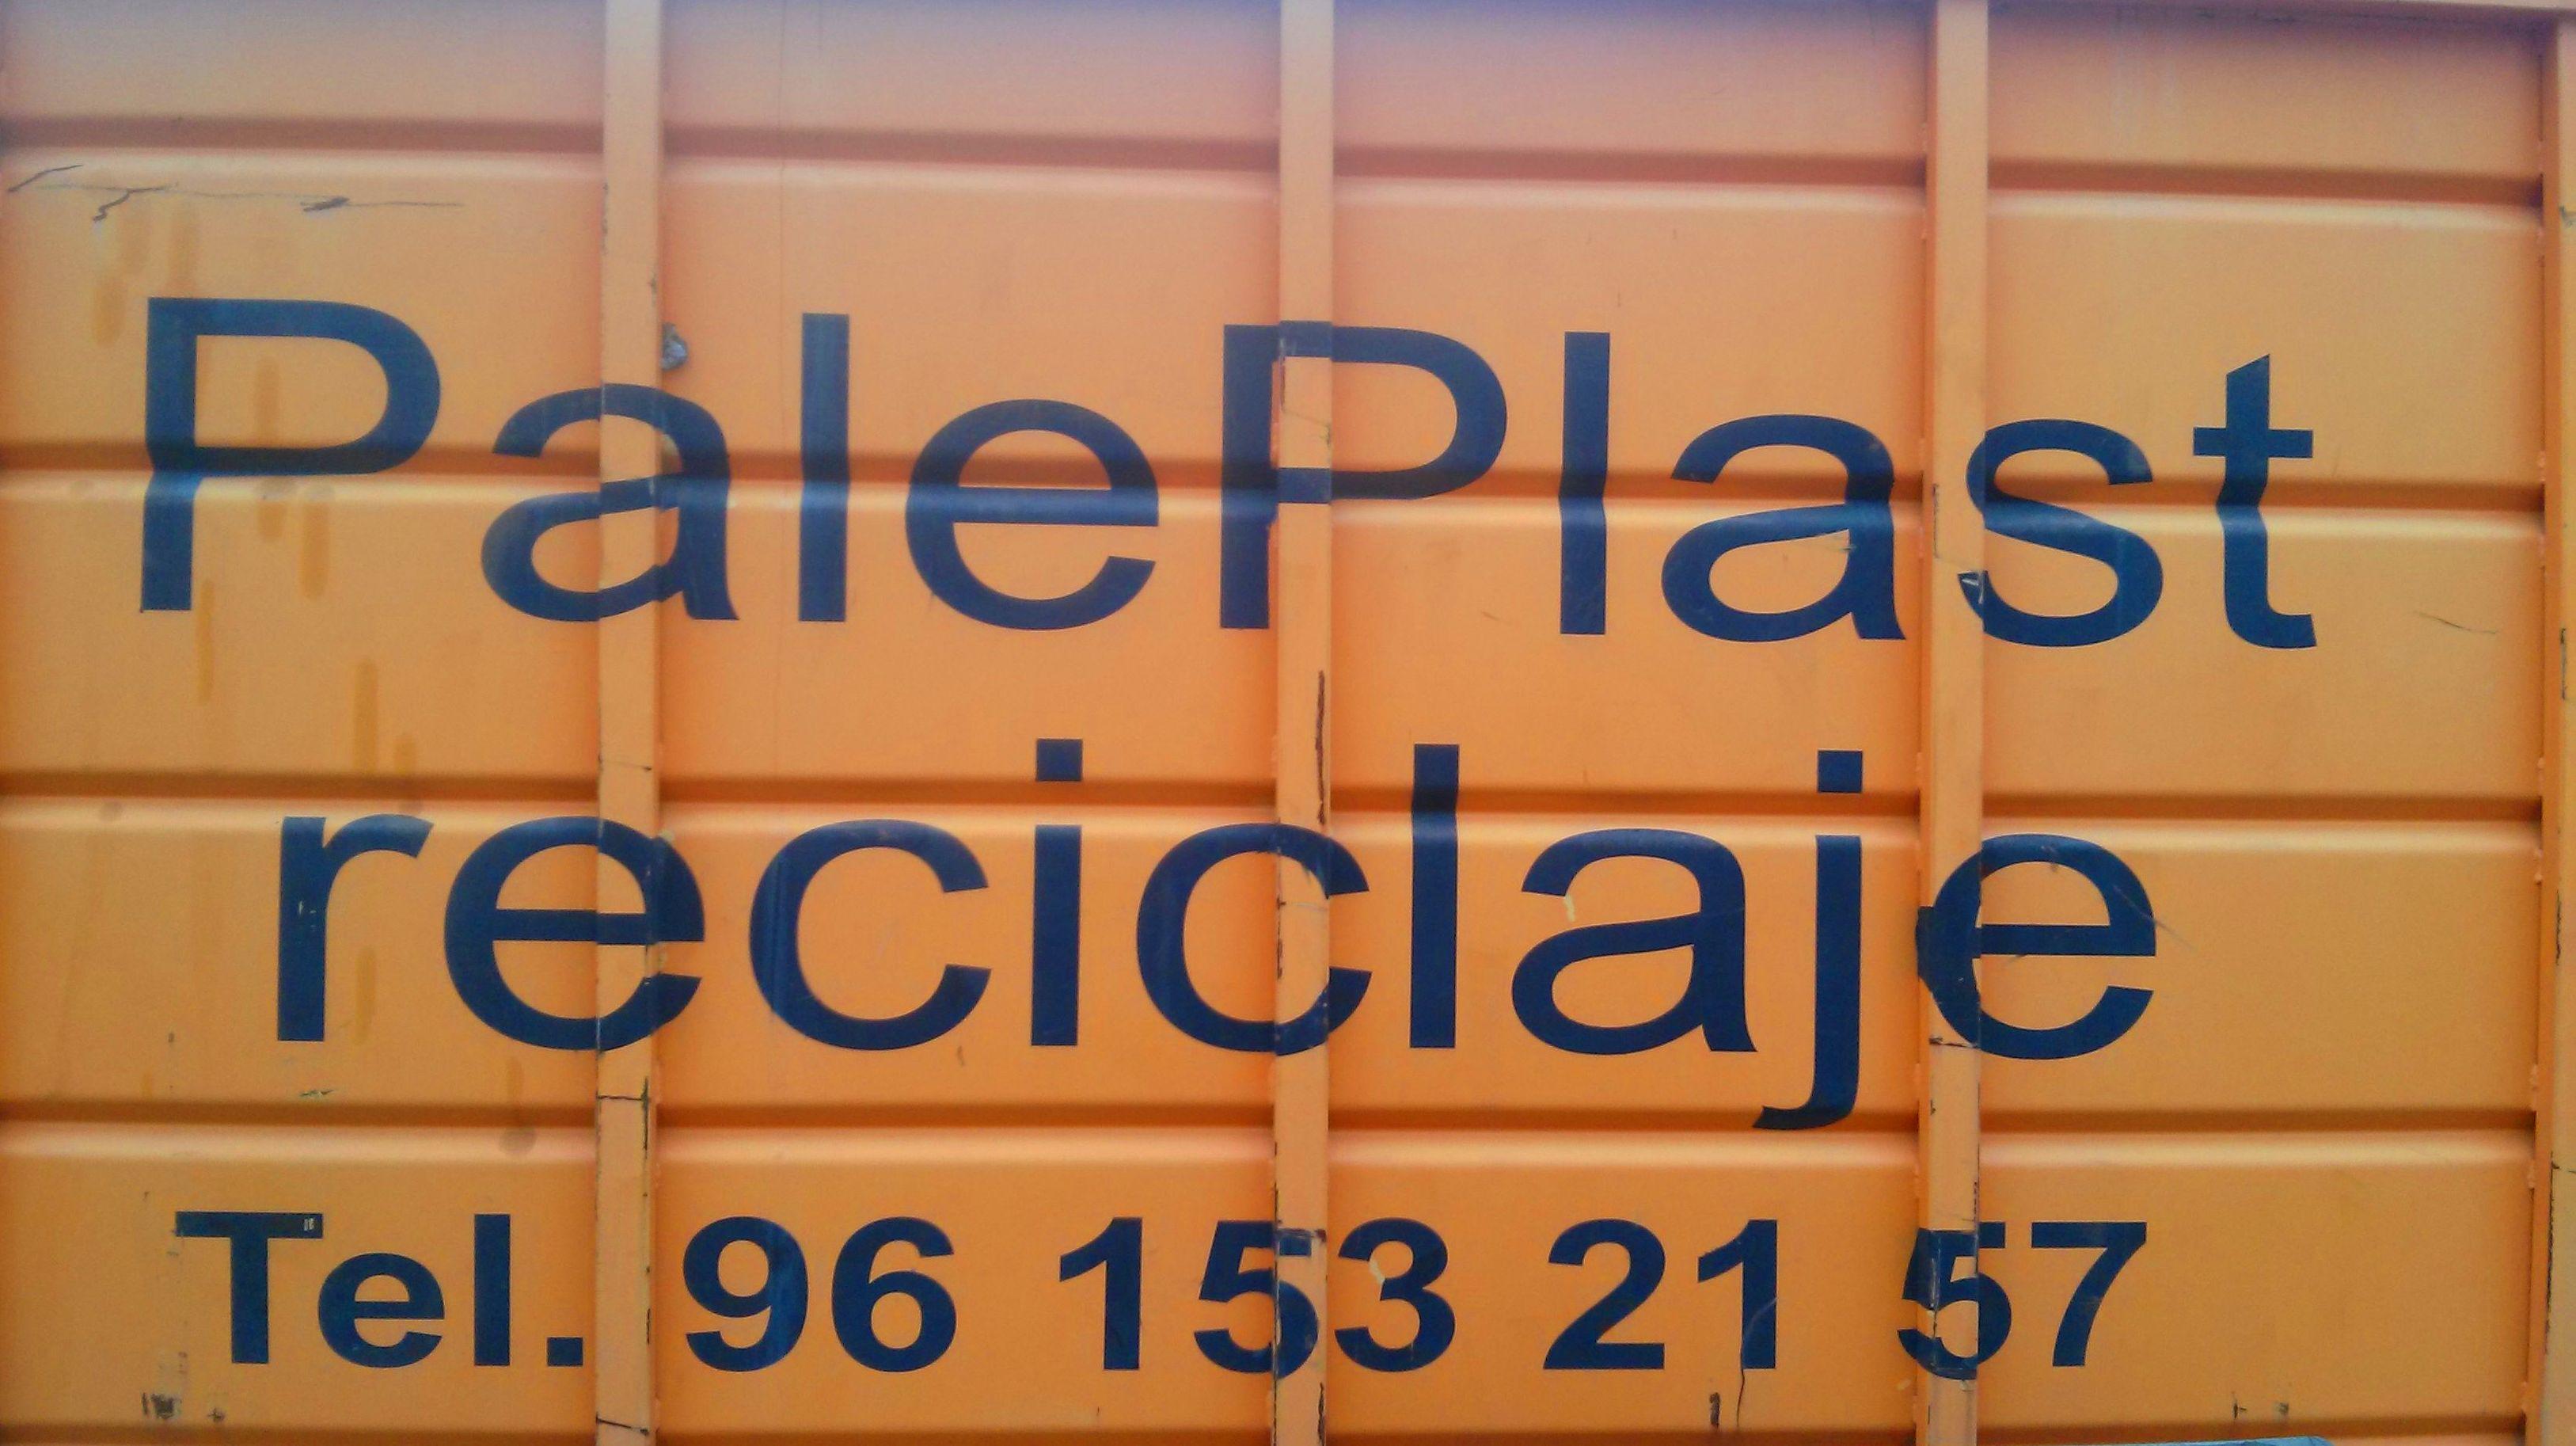 Foto 5 de Reciclaje de residuos en Manises | PalePlast, S. L.